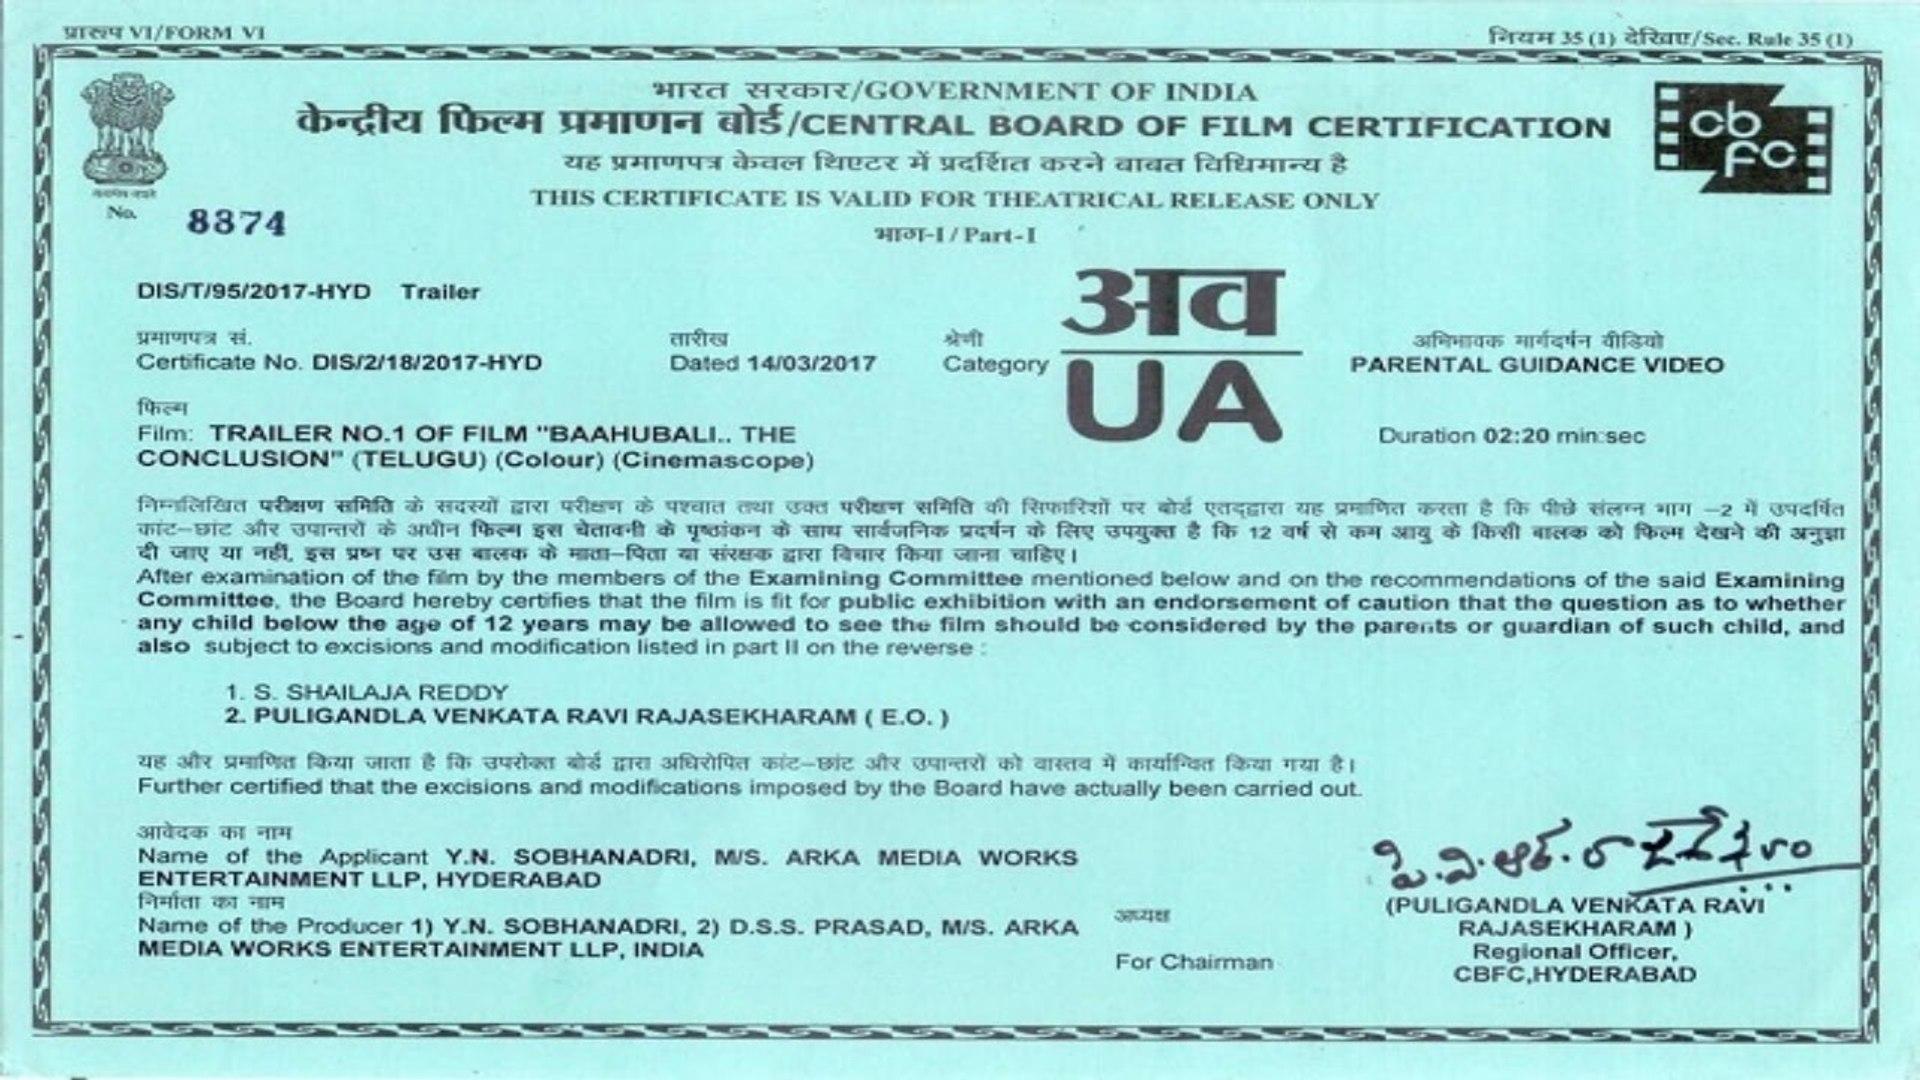 Welcome To New York (2018 Film) Full Hindi Movie Online With English  Subtitles - Karan Johar, Diljit Dosanjh, Lara Dutta, Sonakshi Sinha,  Riteish Deshmukh,Boman Irani